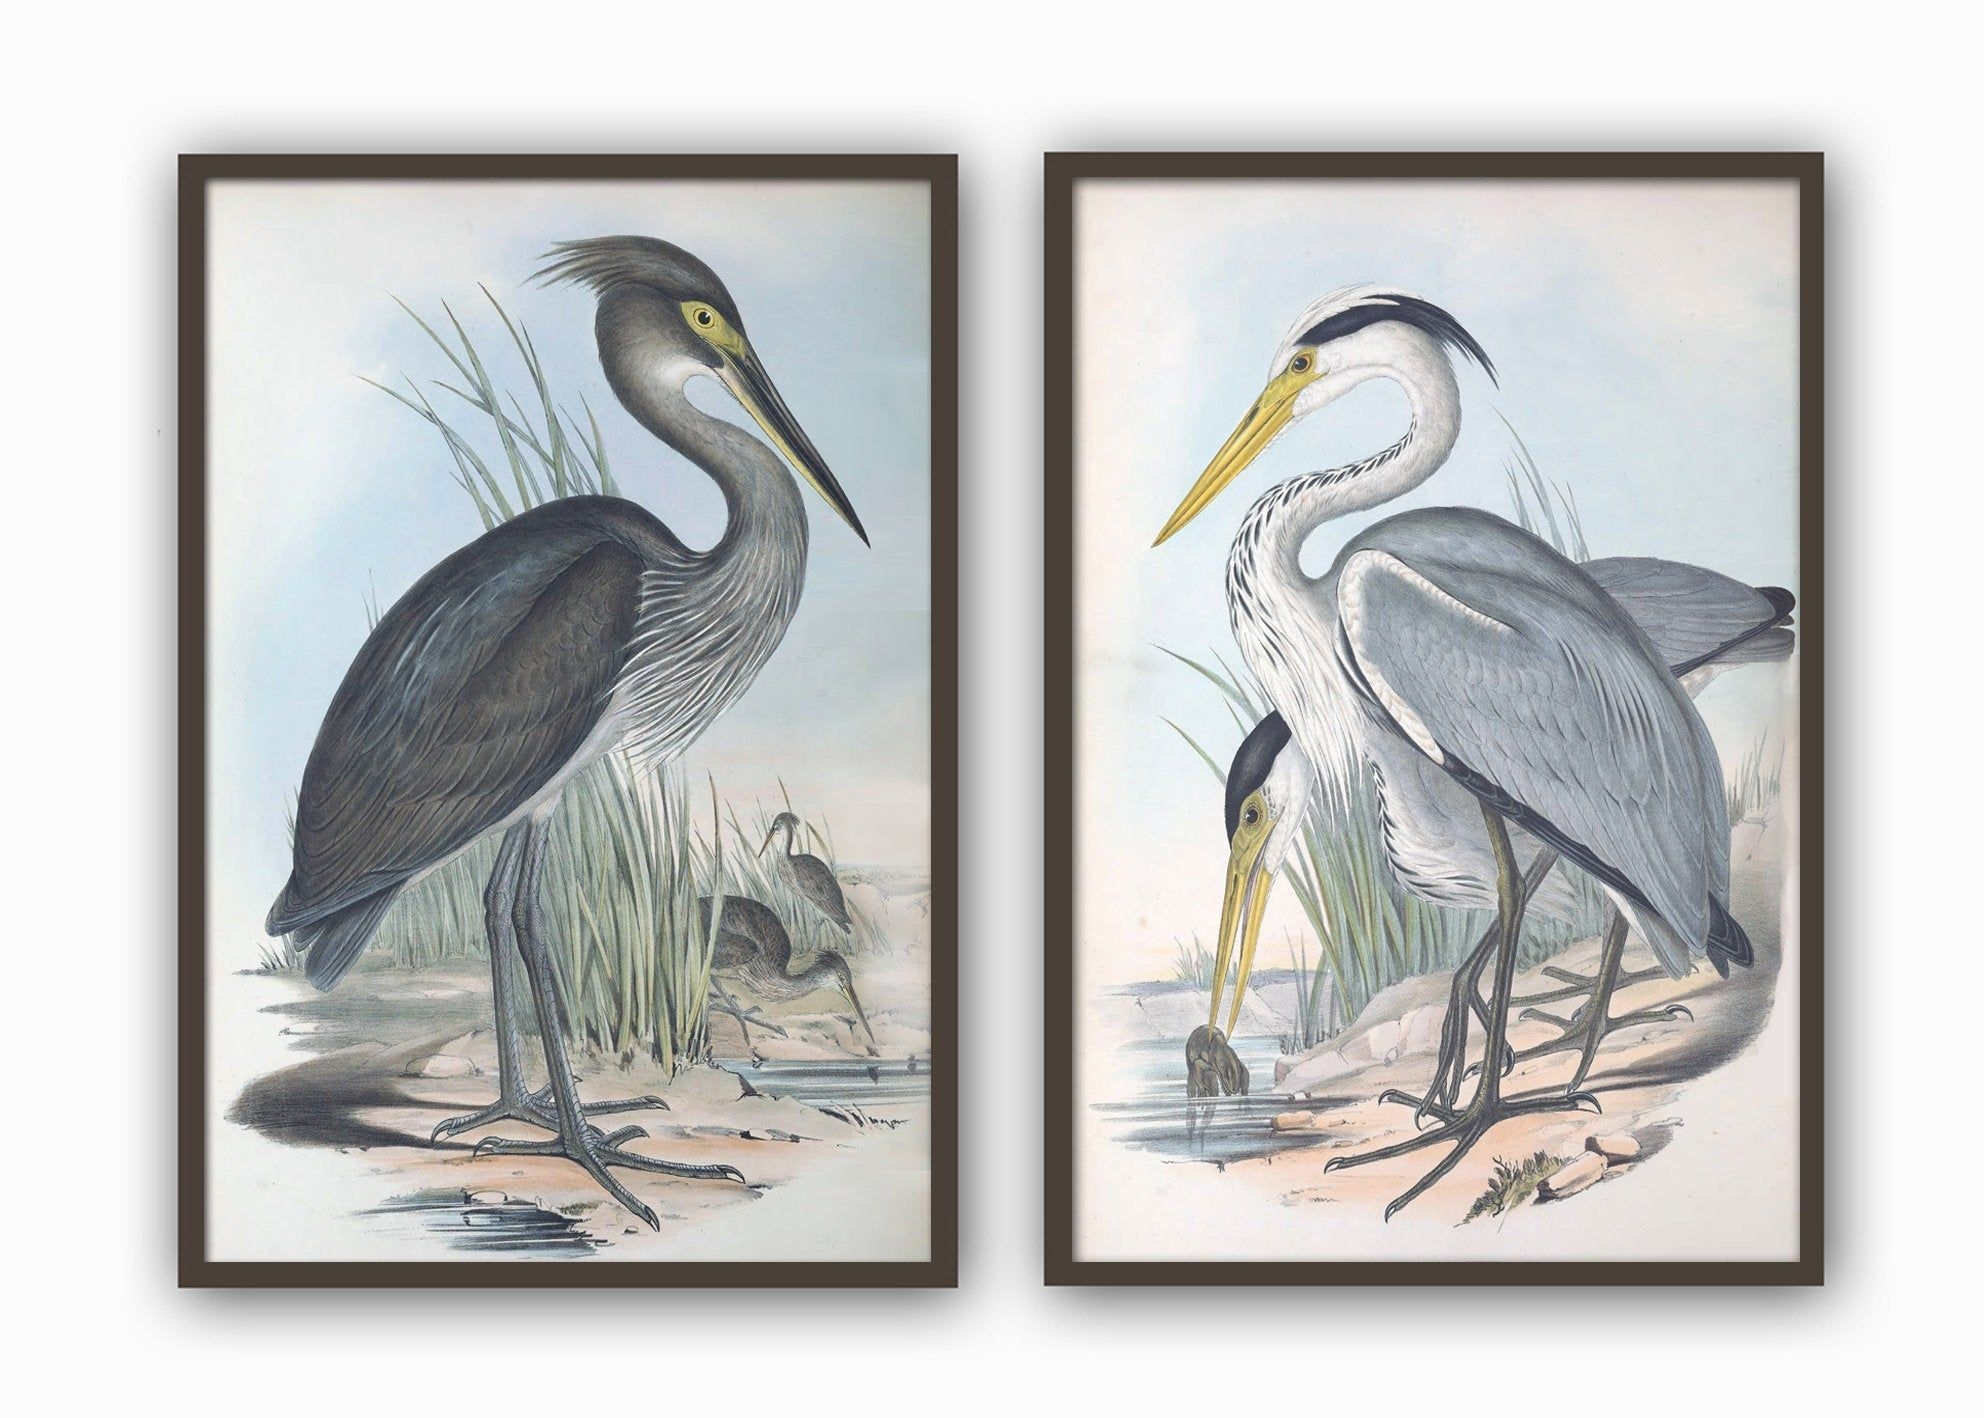 Birds Print Set Of 2 Crane And Heron Print Large Wall Art Etsy In 2020 Vintage Bird Illustration Bird Prints Bird Wall Art